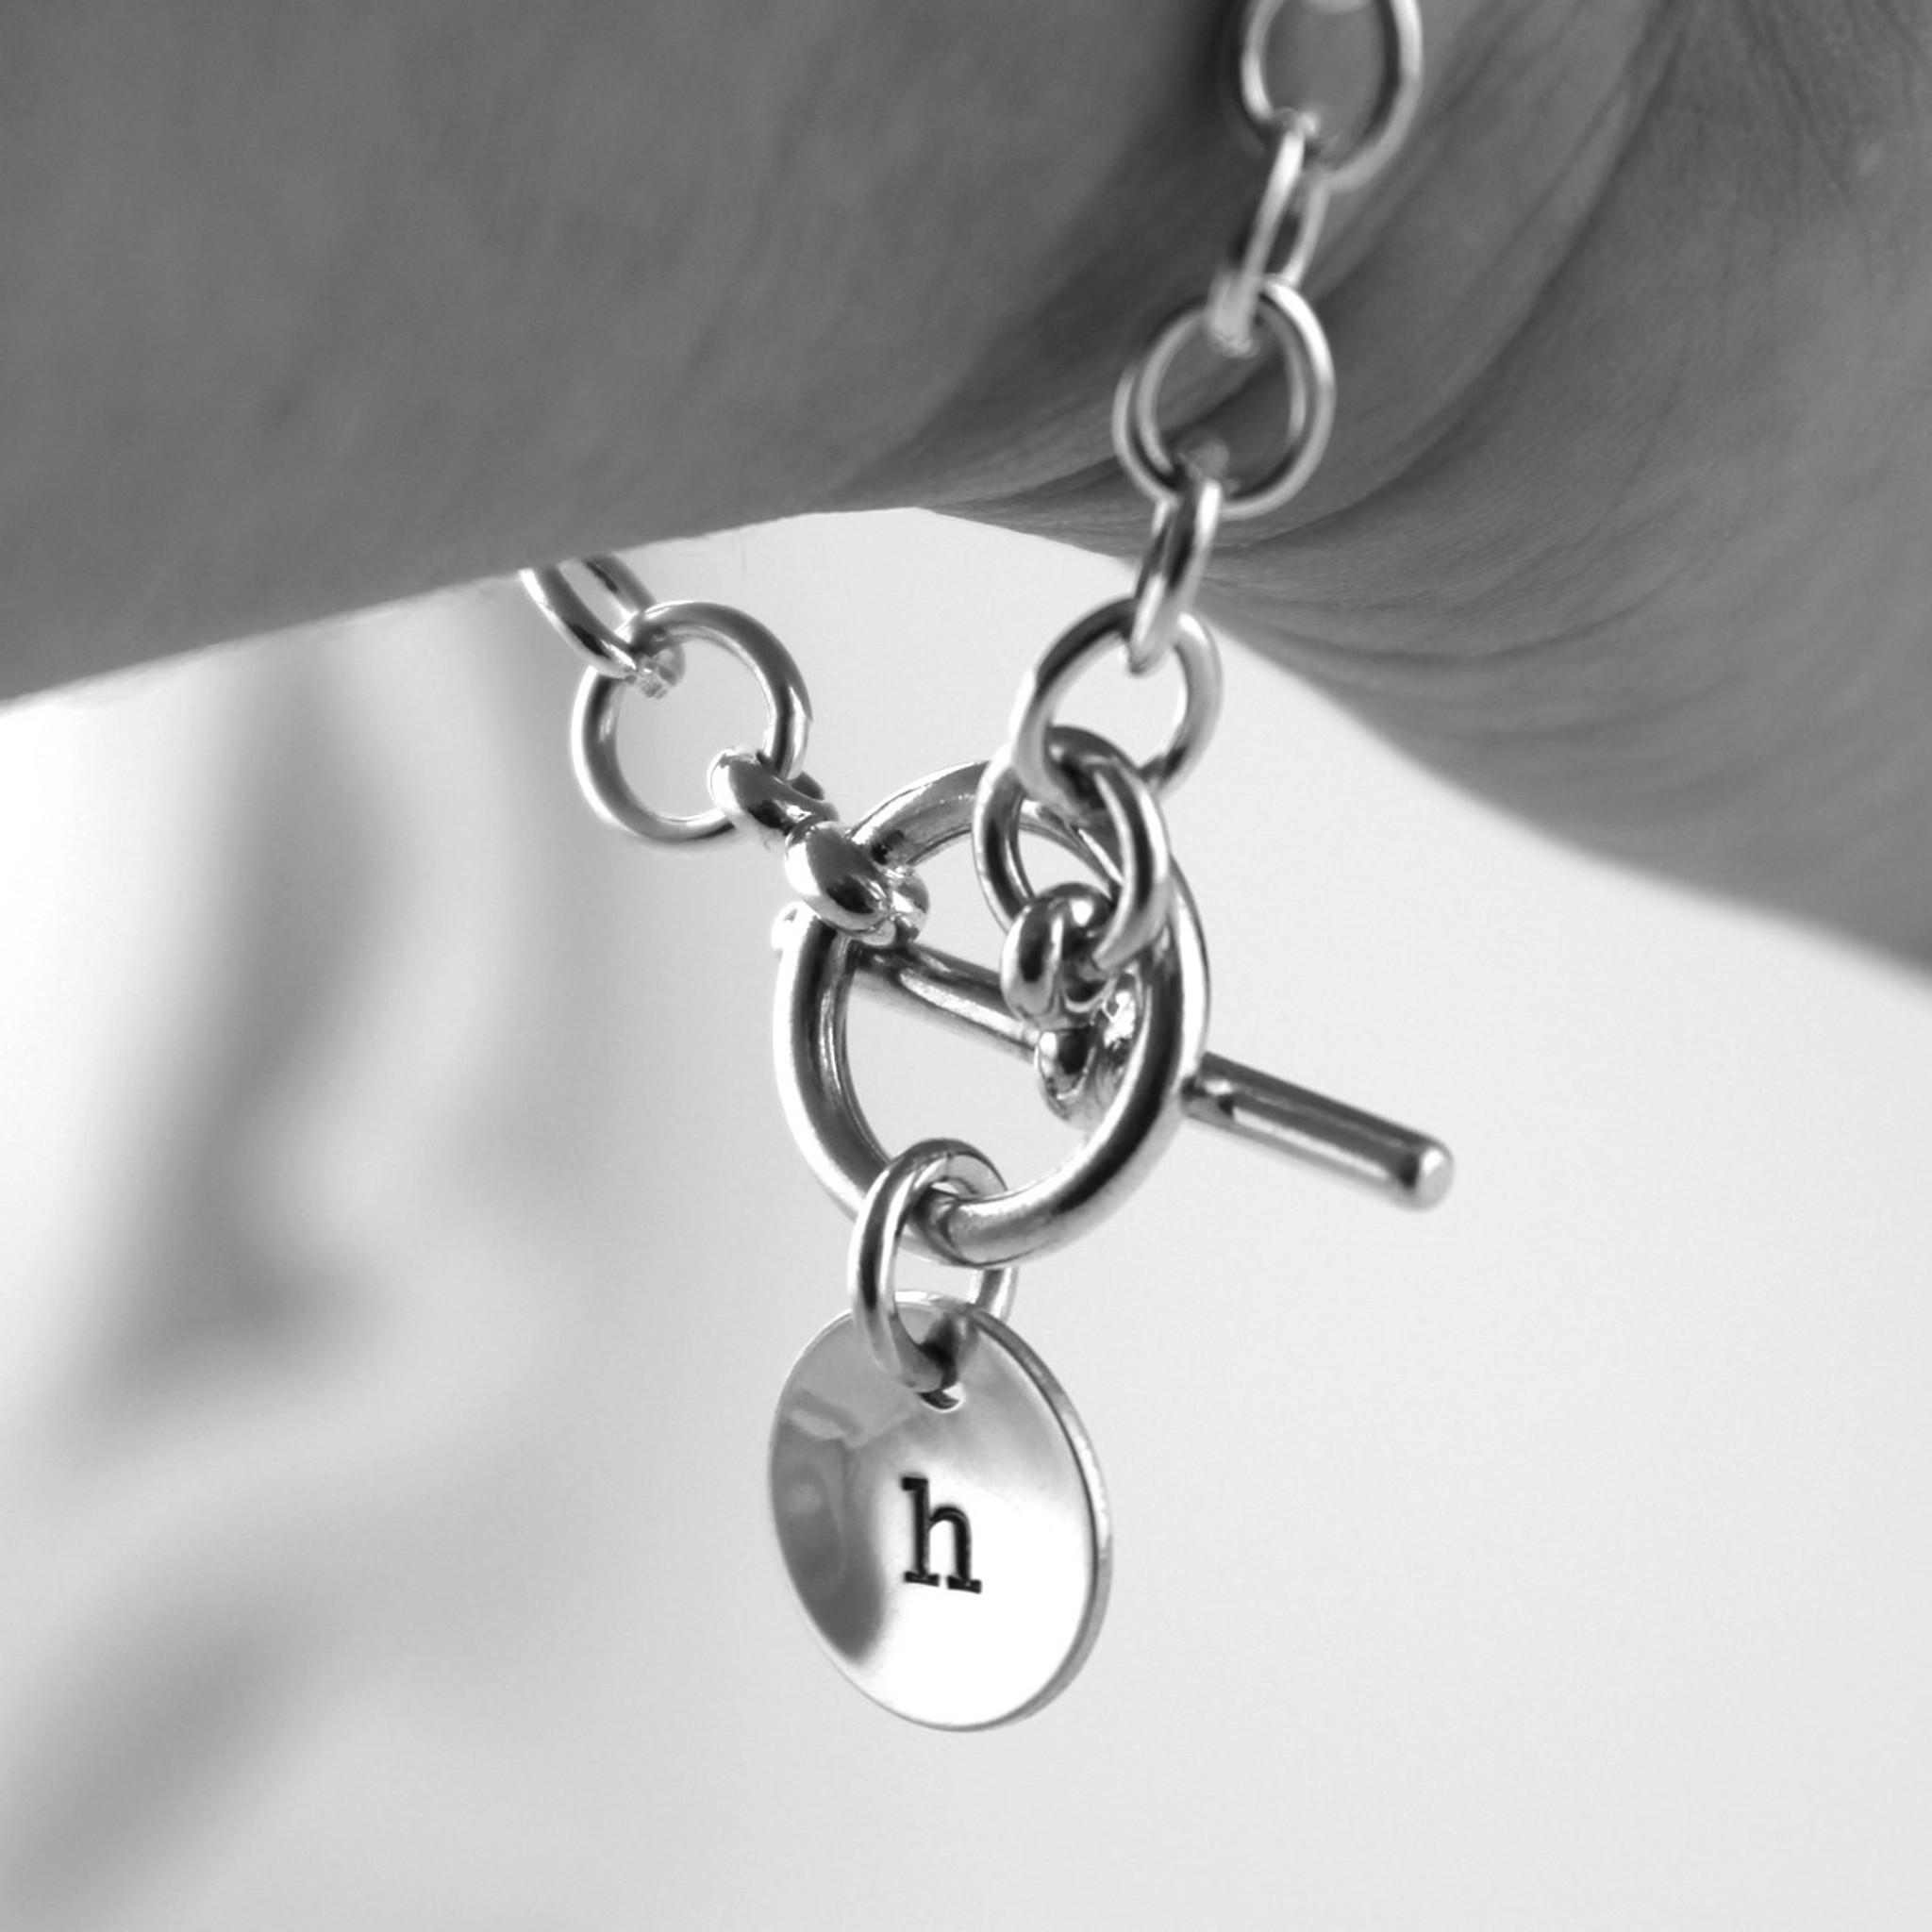 Hey Punky! How do I decide the size of my toggle bracelet?